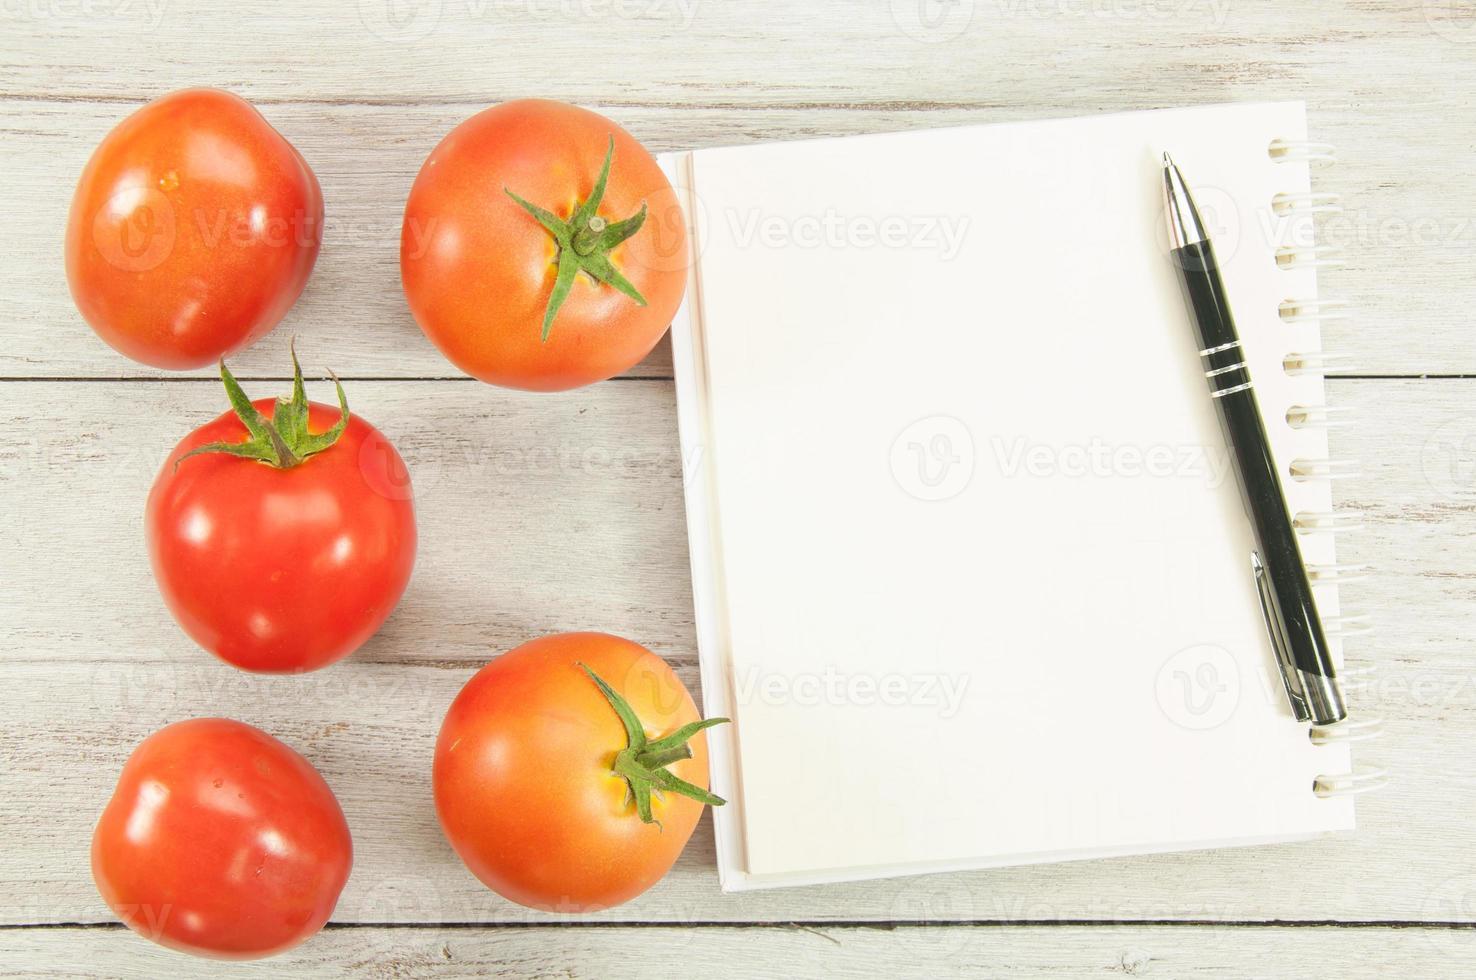 ricettario con ingredienti. foto